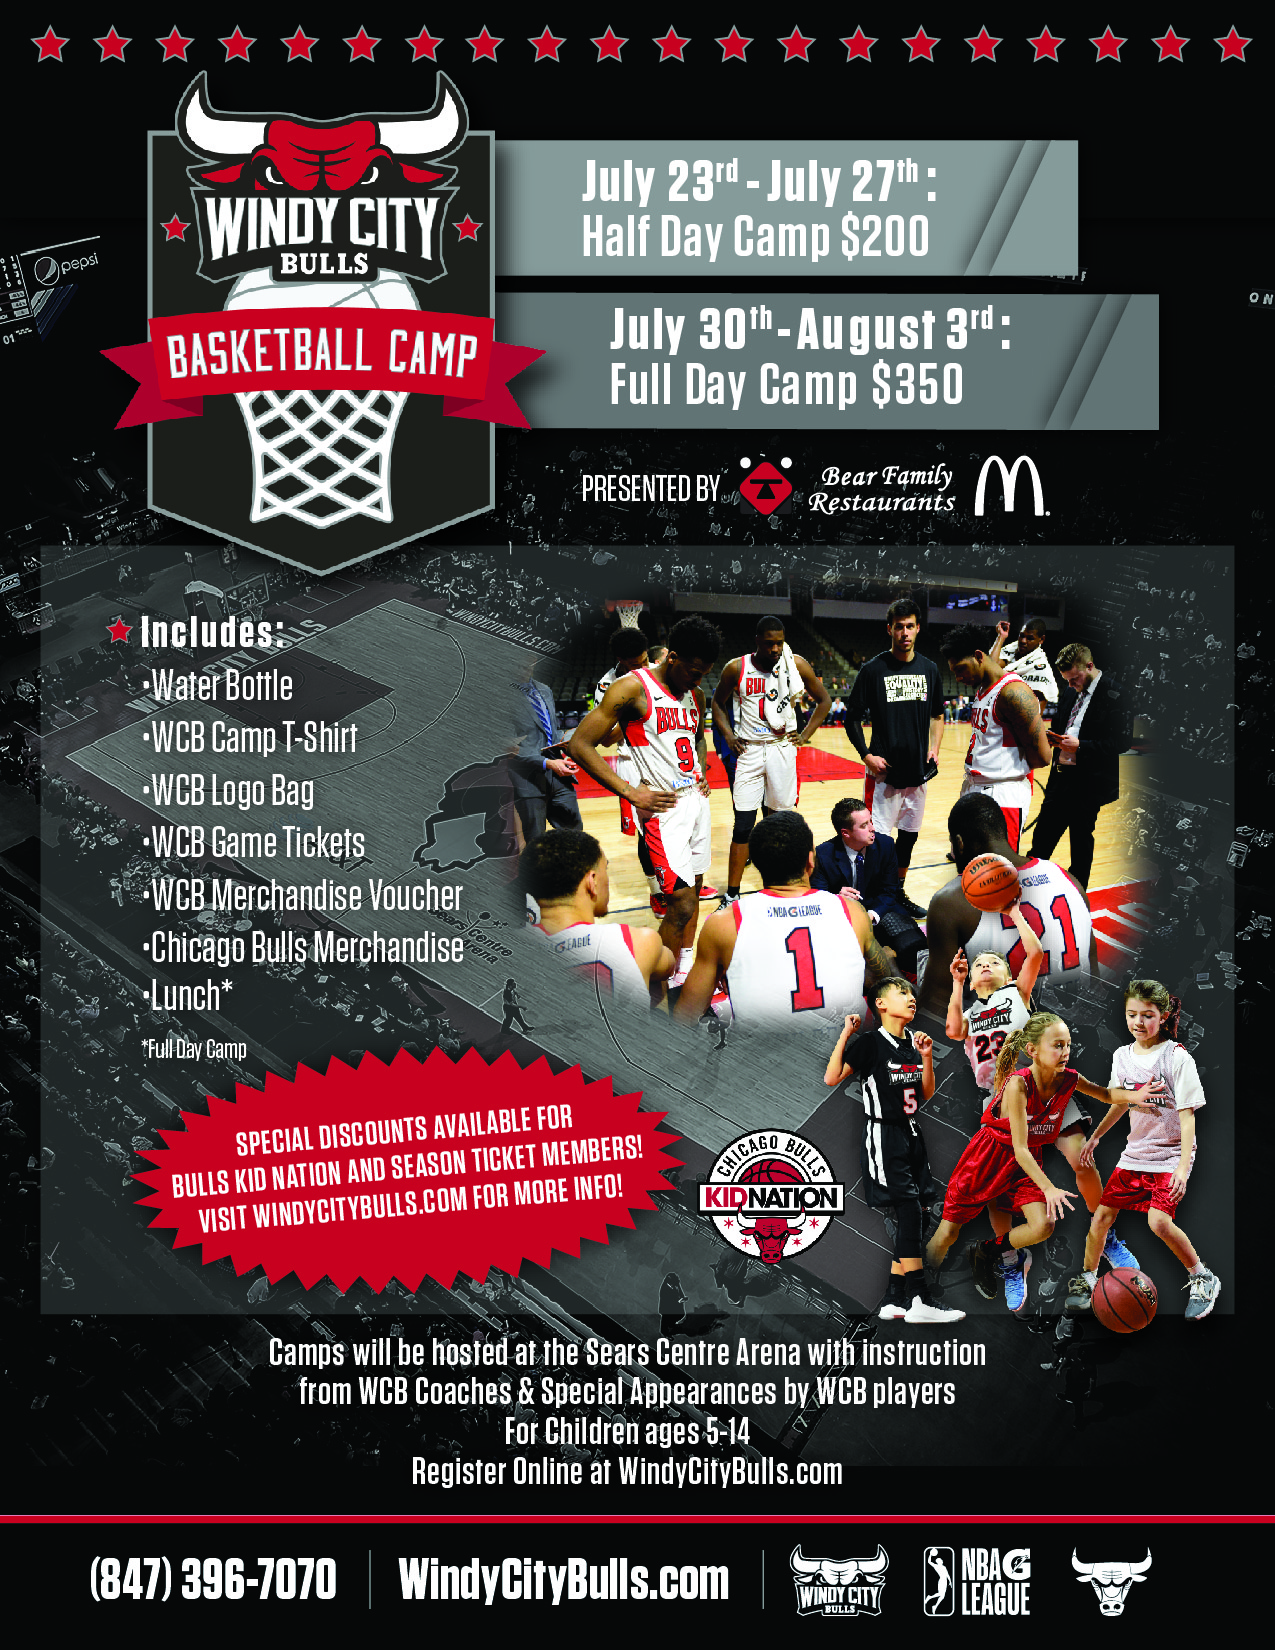 Windy City Bulls Summer Camp